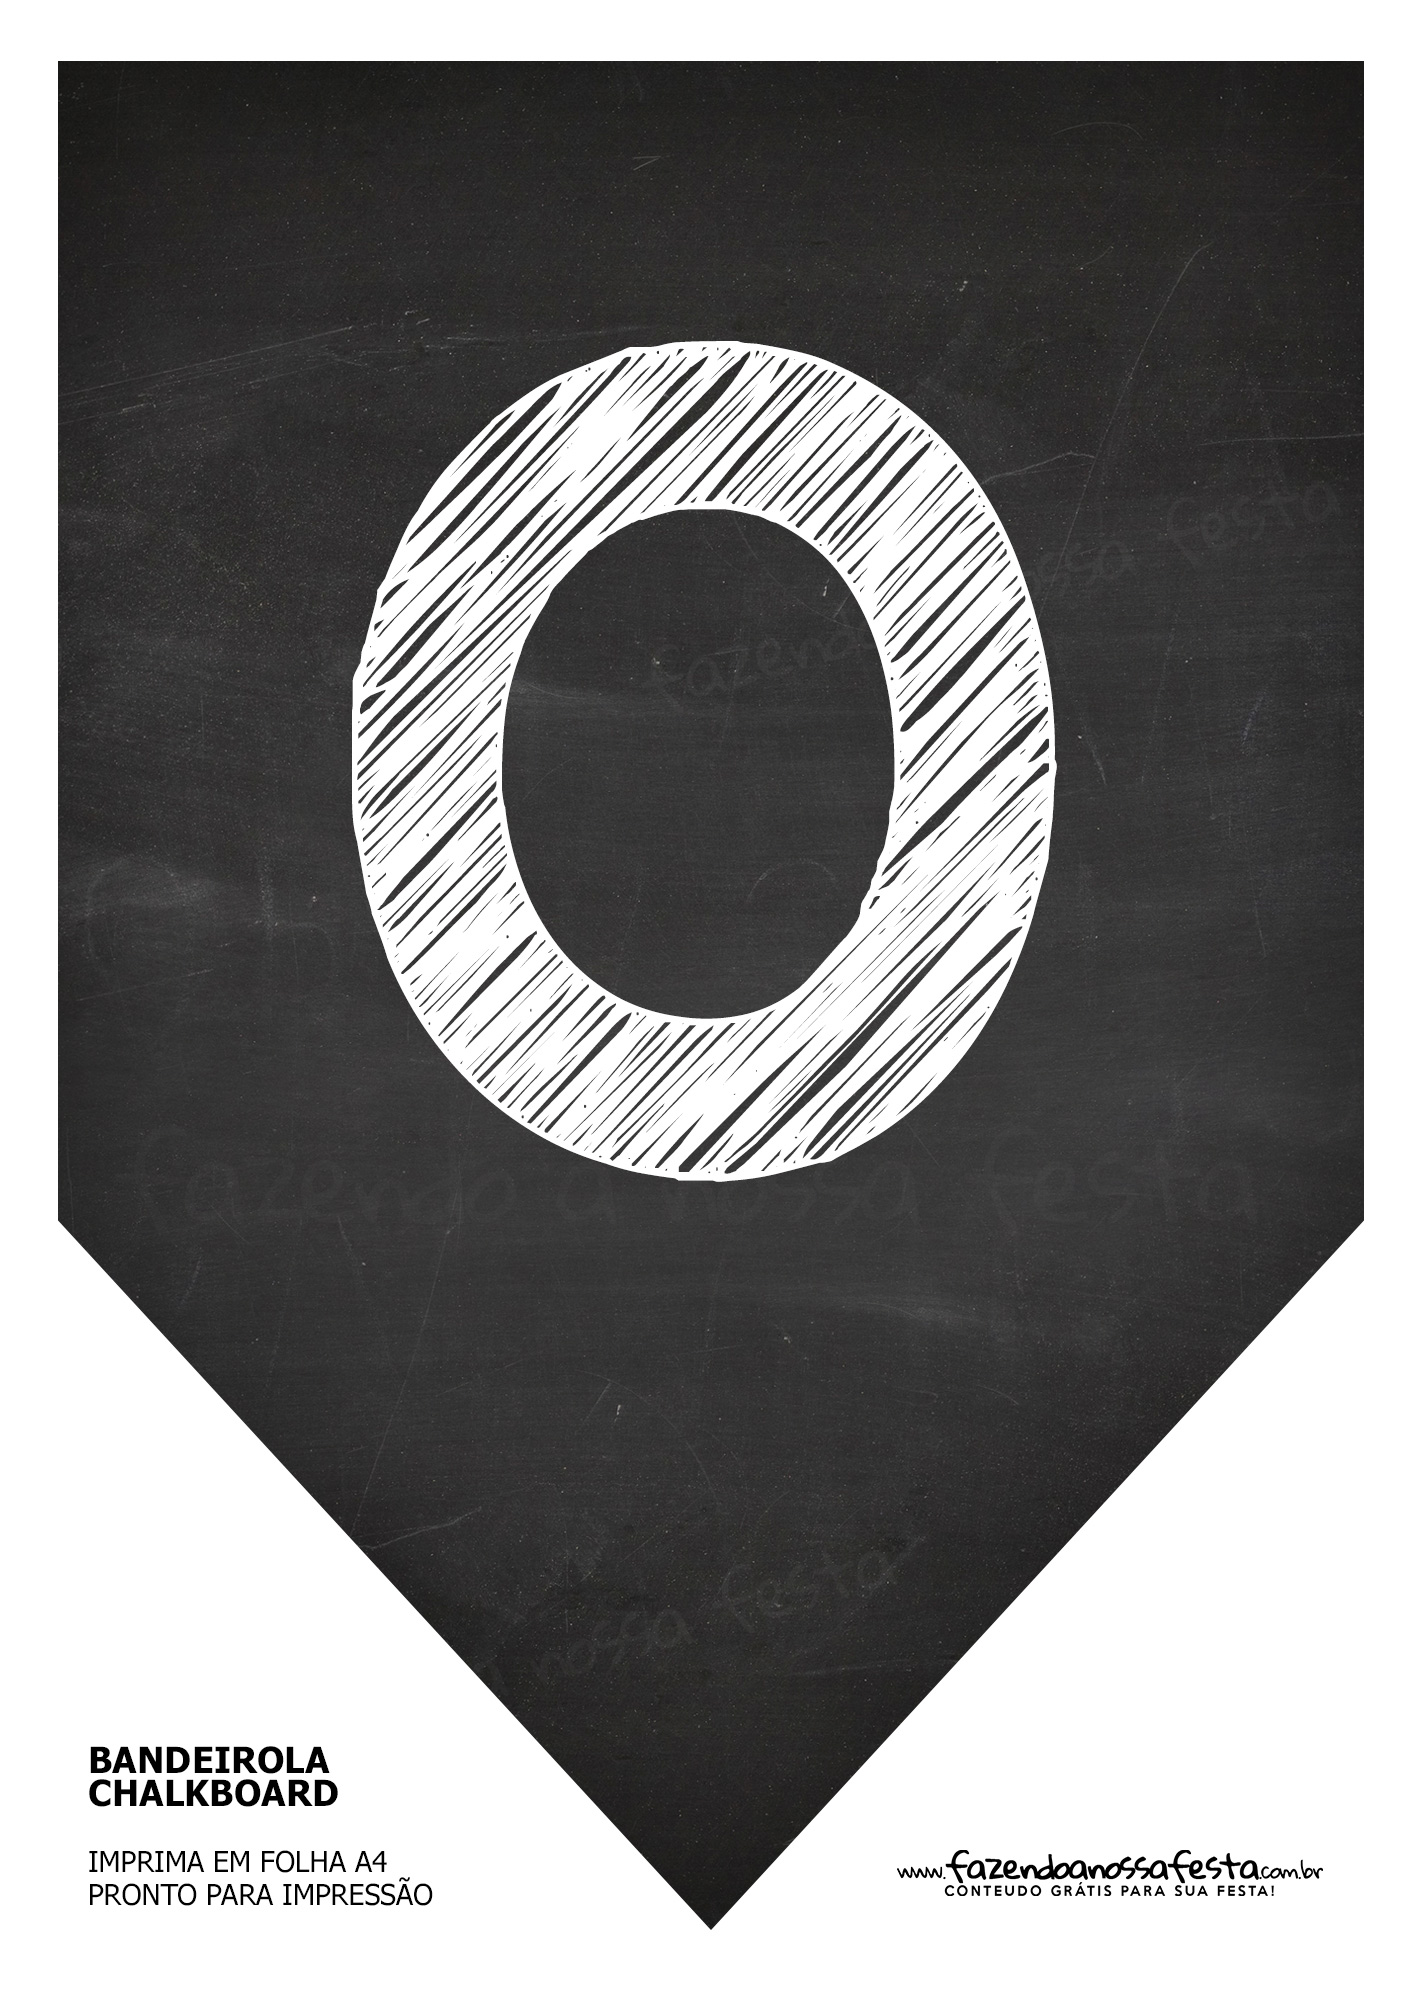 Bandeirinha Chalkboard O